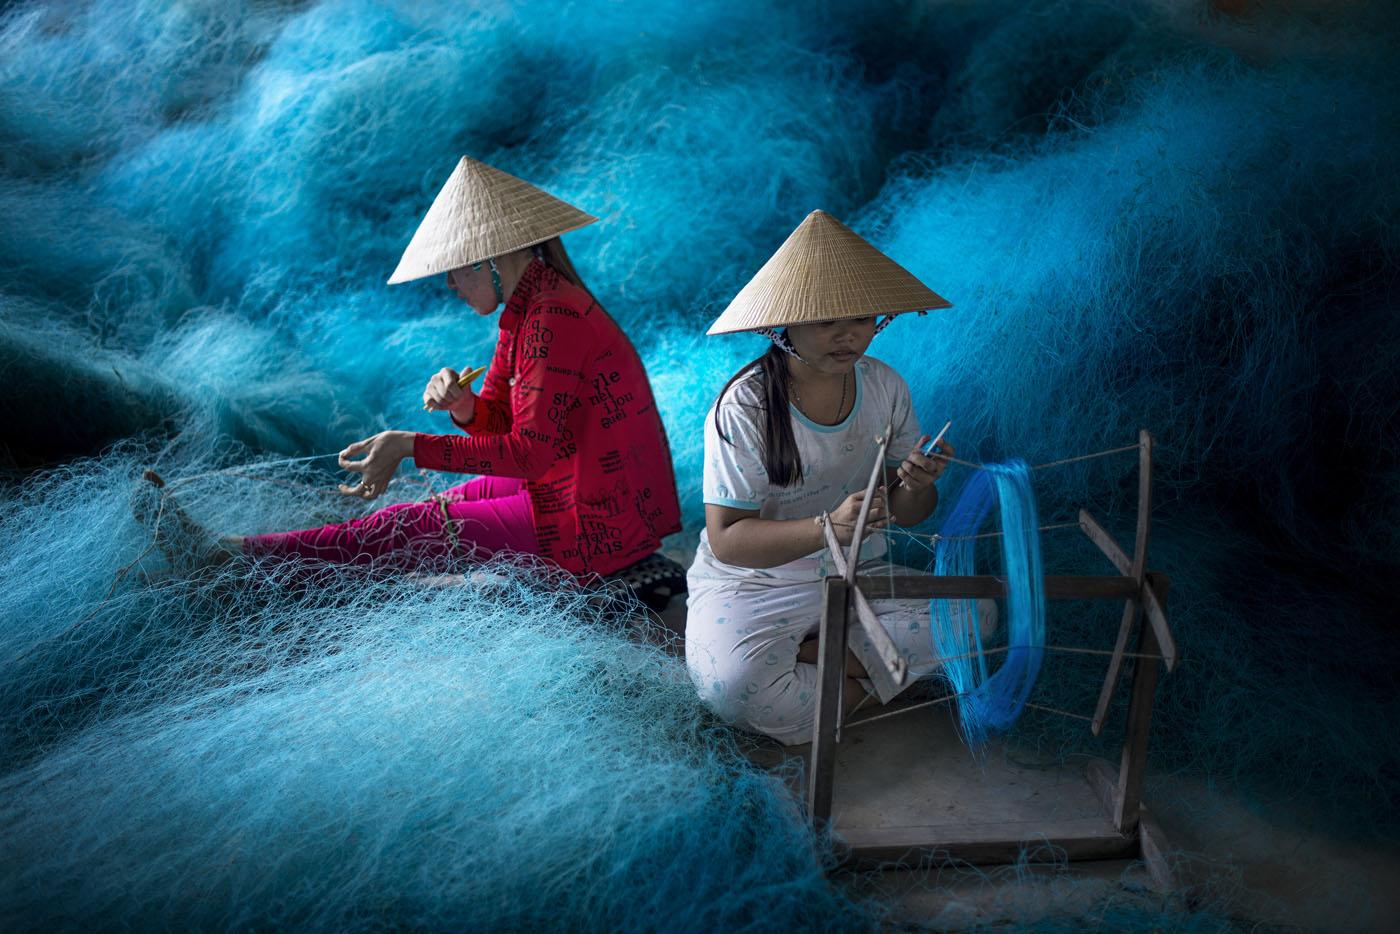 travel photography fisherwomen by burak senbak